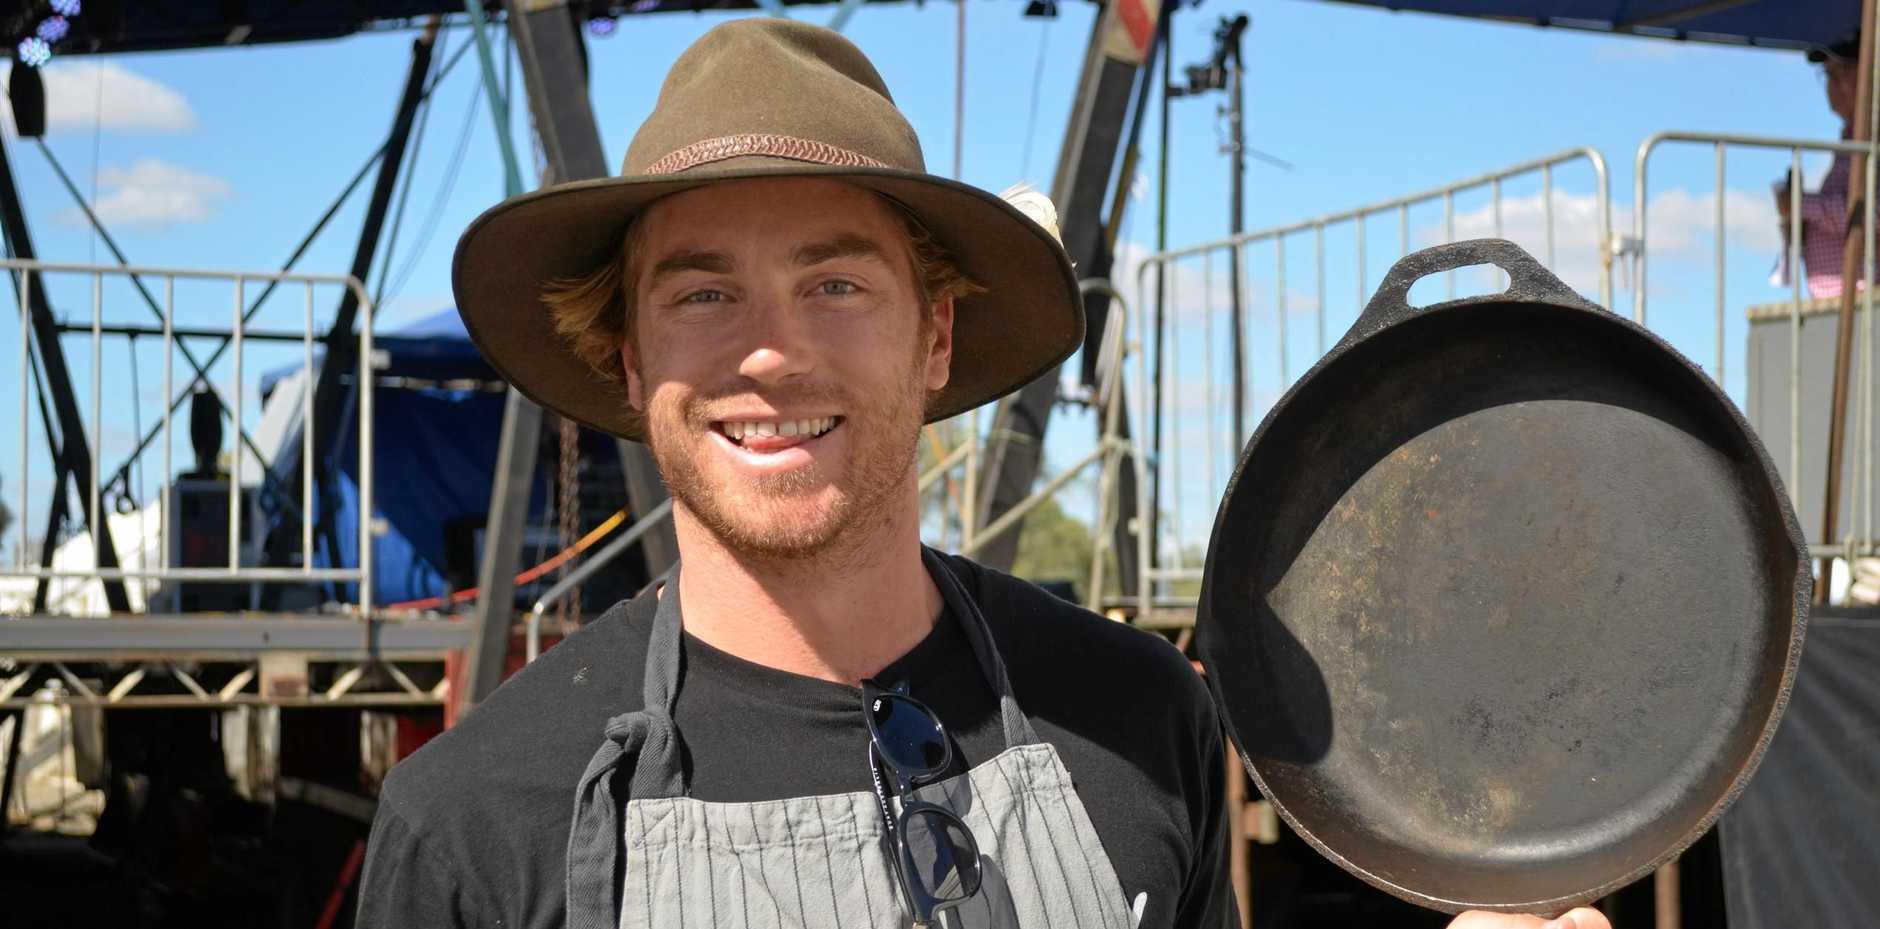 CELEBRITY CHEF: MasterChef winner, Hayden Quinn was on hand to offer cooking tips at Big Skies 2018.